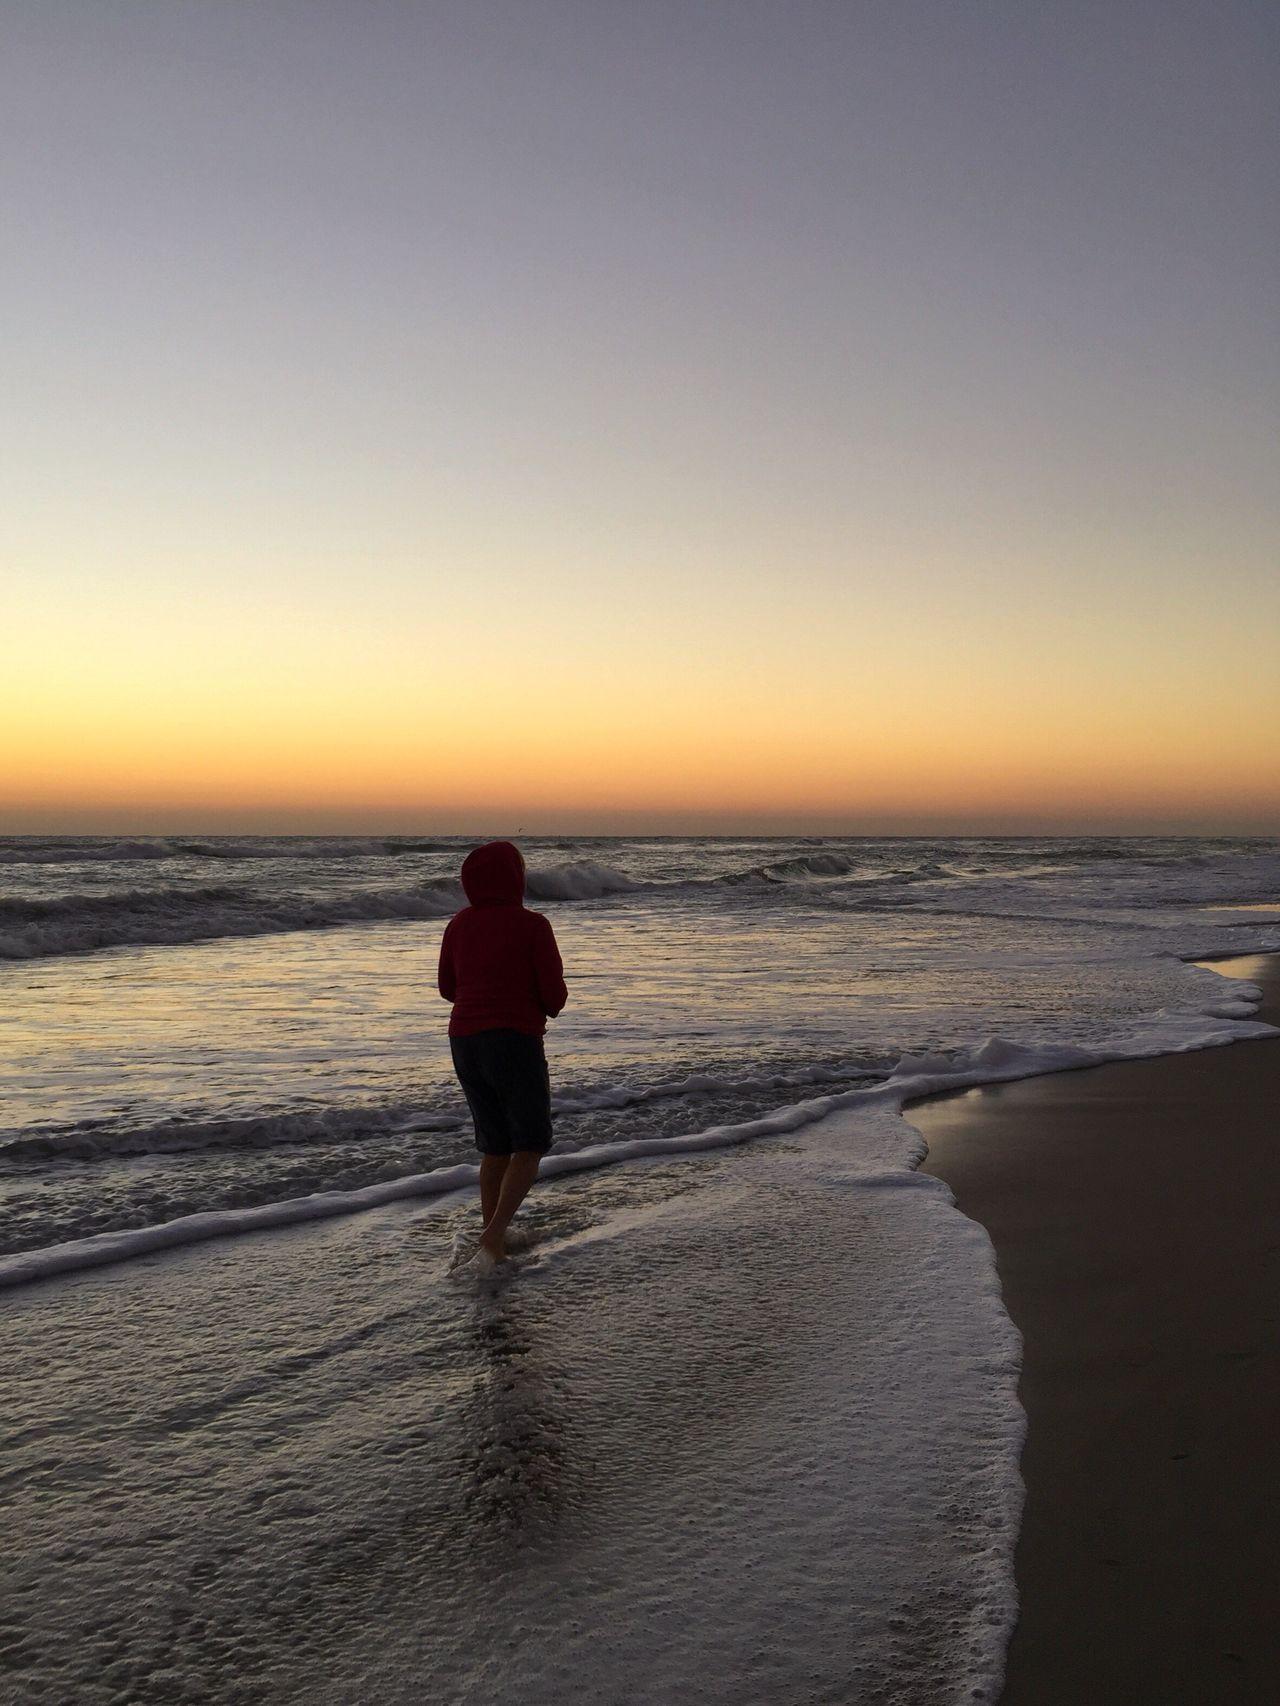 Chilly dawn walker Sunrise - Dawn Melbourne Beach, FL Beach Beach Walking Leisure Activity Lifestyles